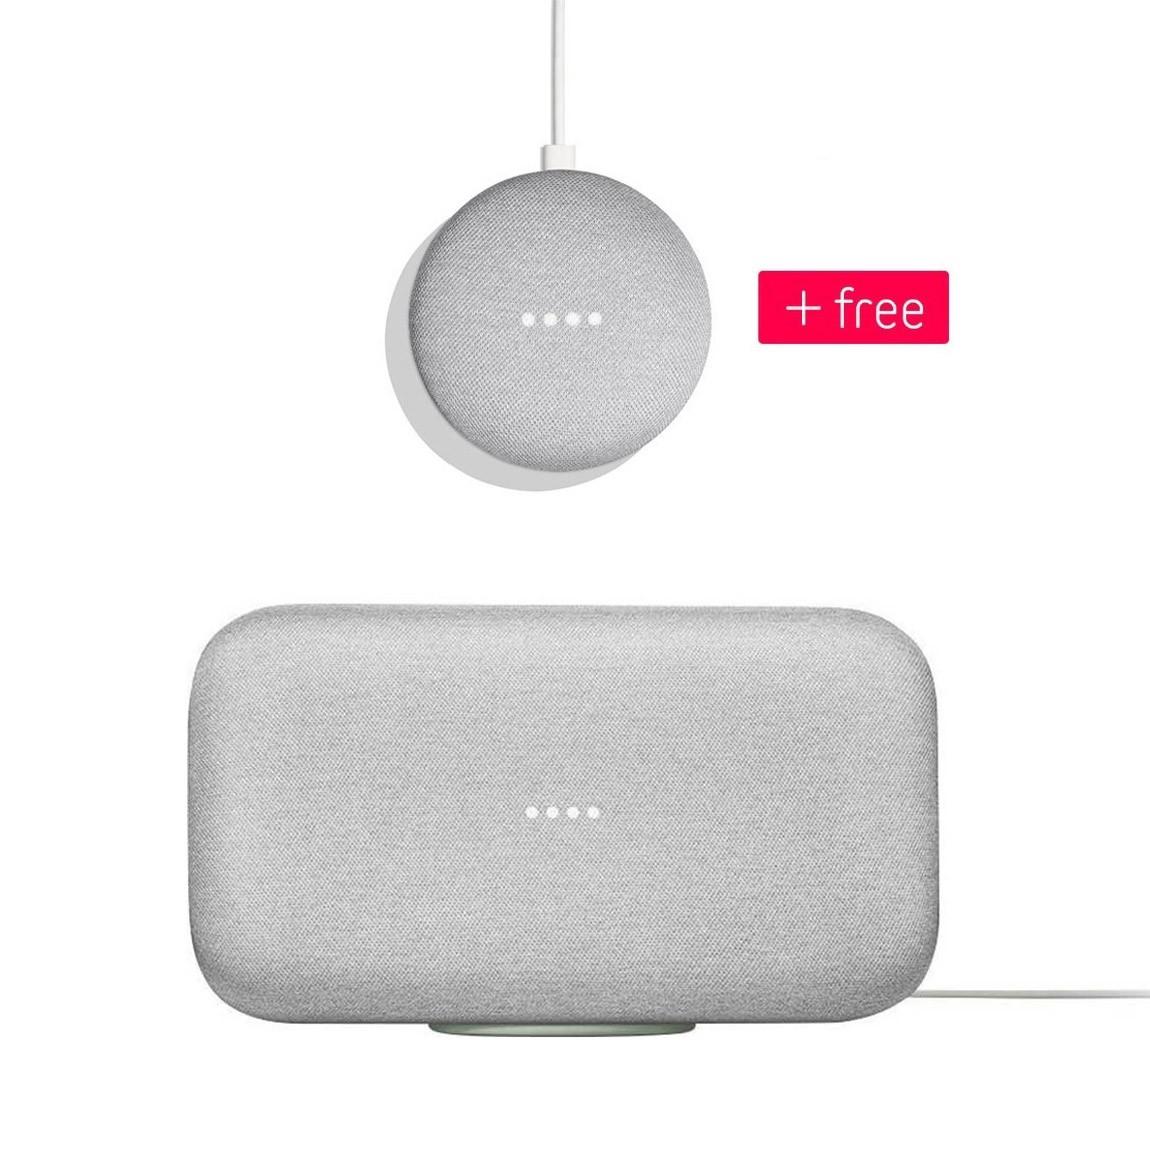 Google Home Max + Google Home Mini for $199 & More